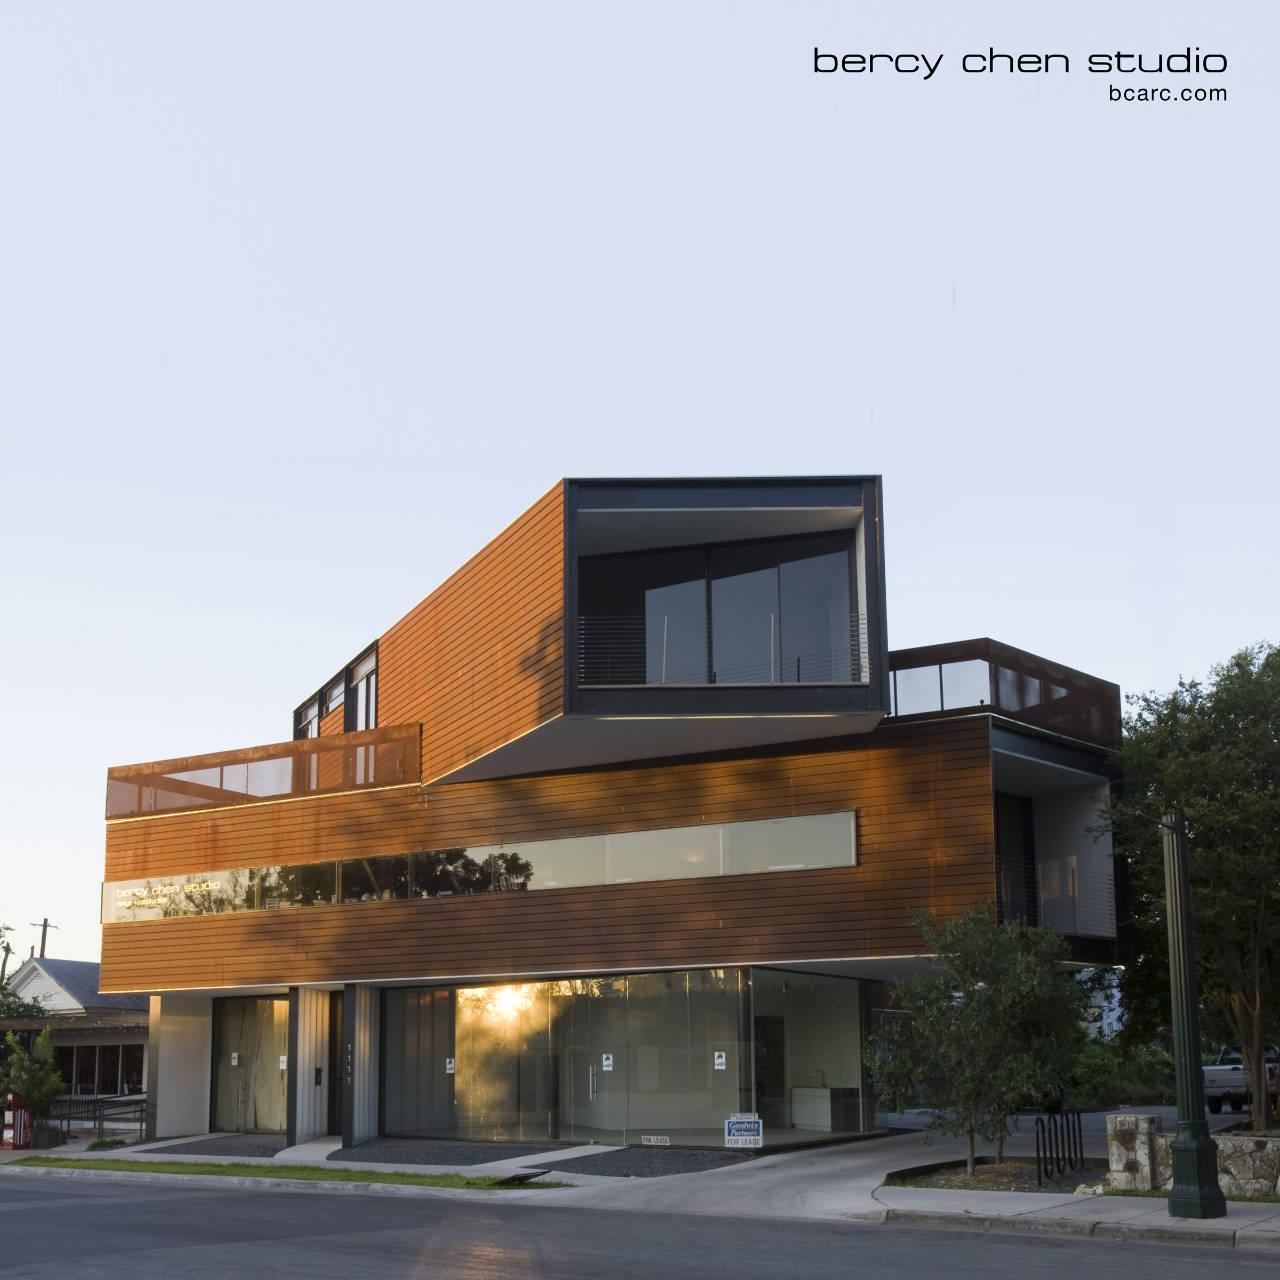 1111 / Bercy Chen Studio, © Bercy Chen Studio